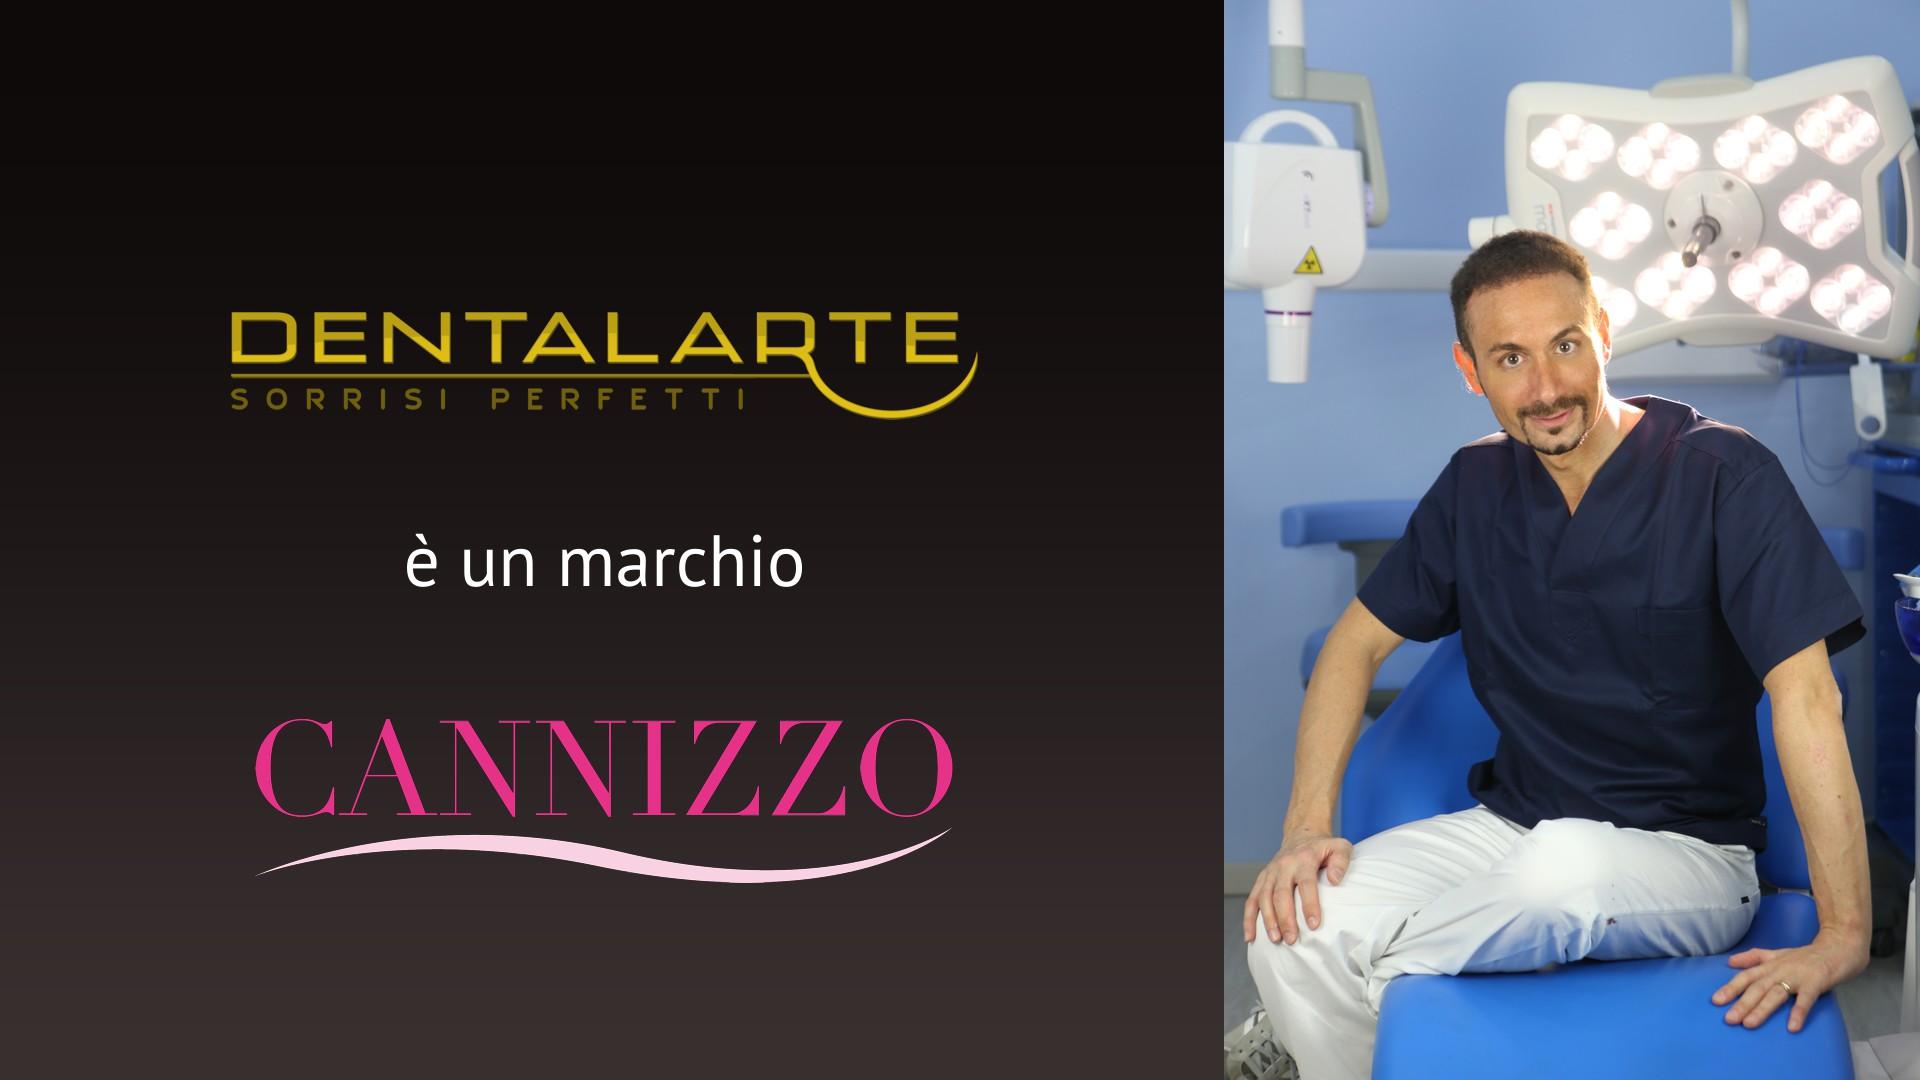 Dentalarte estetica dentale